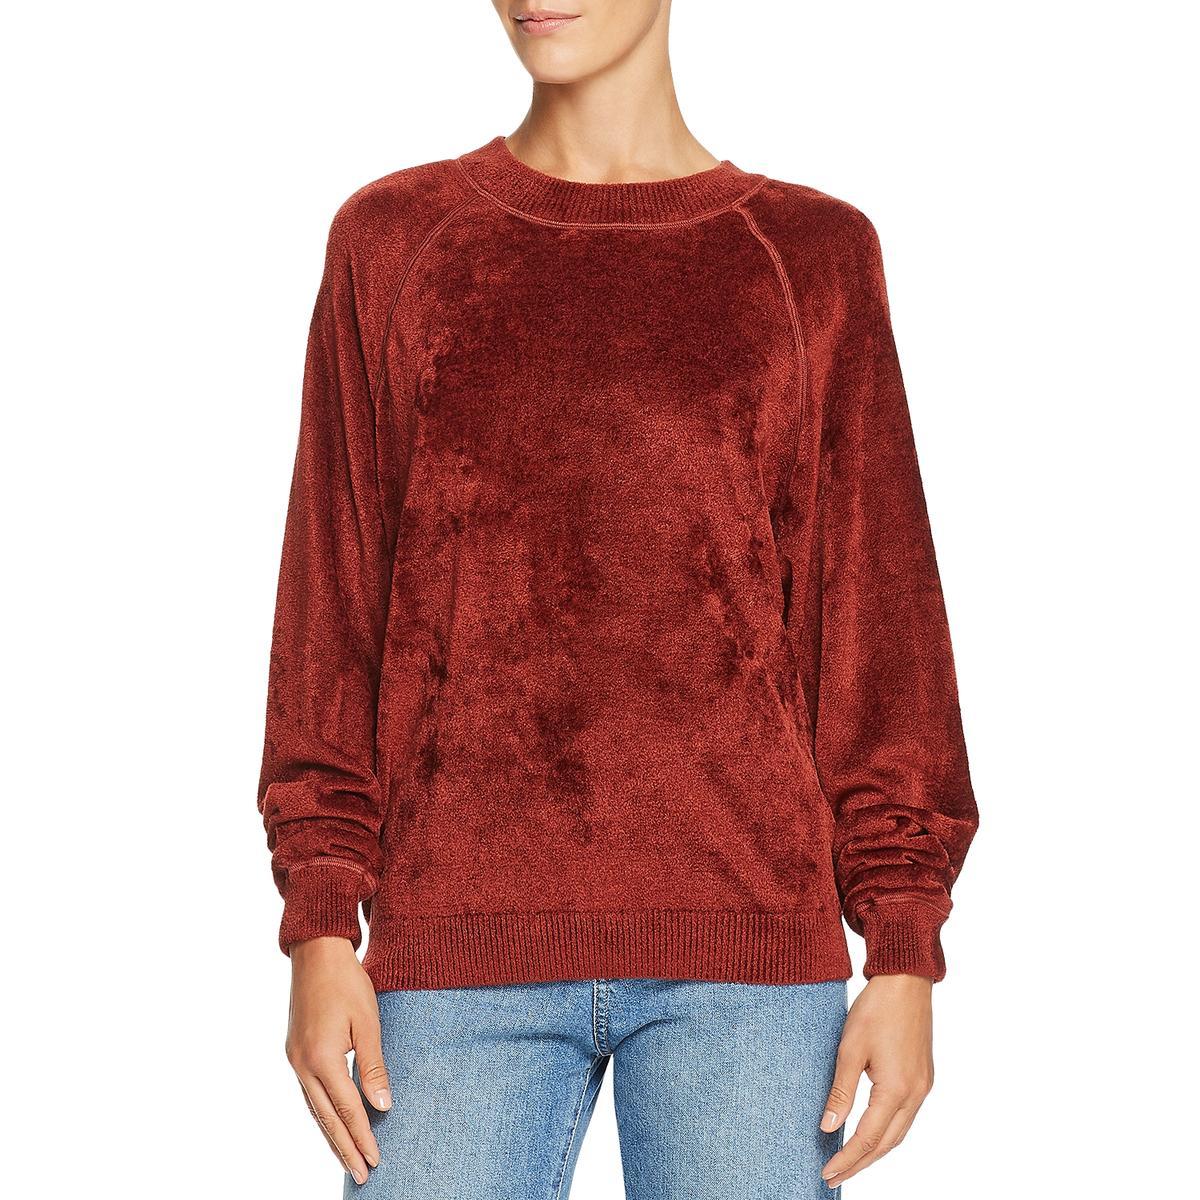 Elizabeth and James Womens Orange Luxery Velvet Sweatshirt Top L BHFO 8181